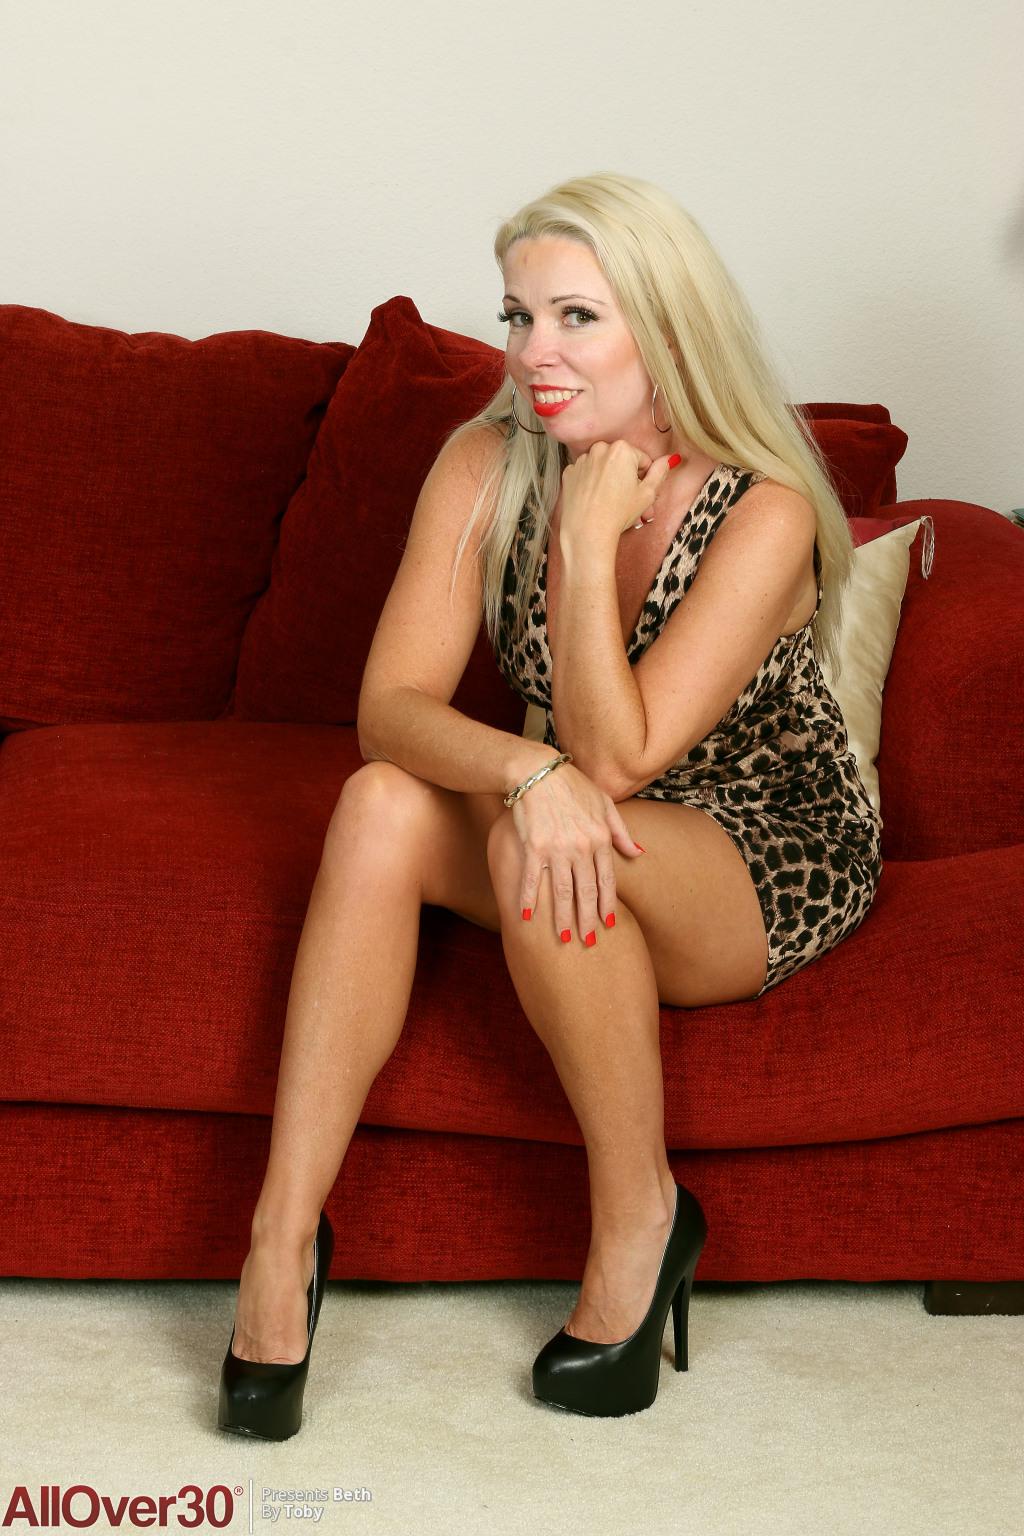 Beth from AllOver30